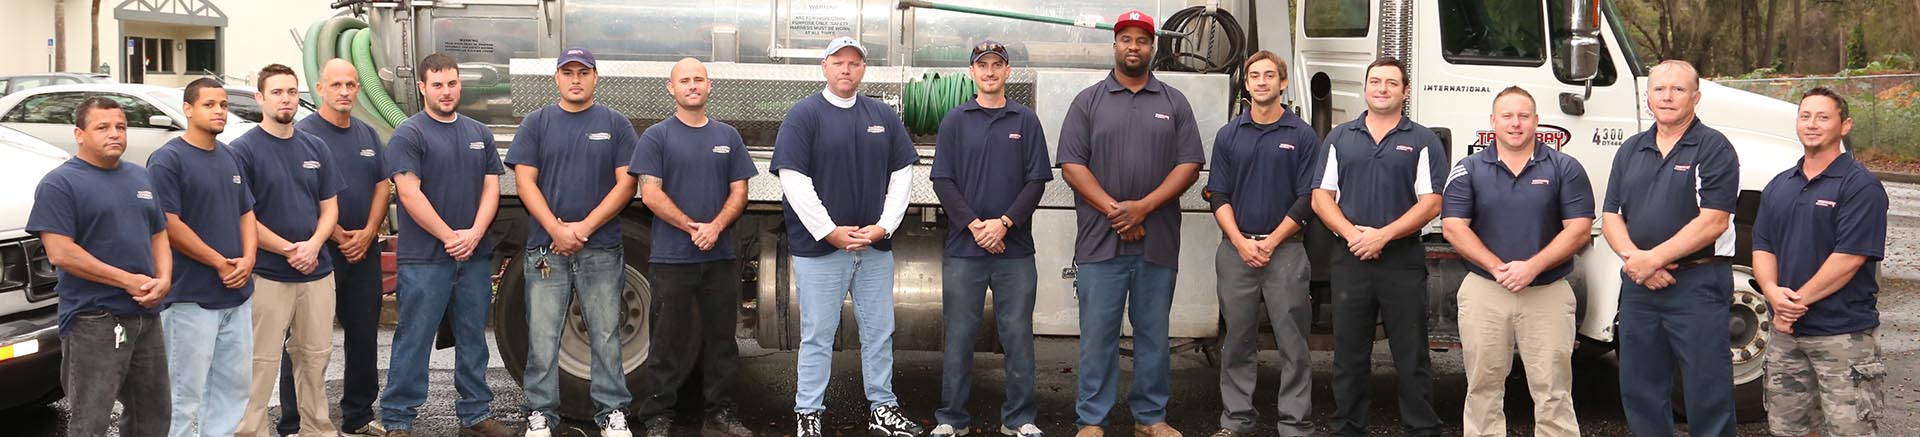 Tampa Bay Plumbers Plumbing Team